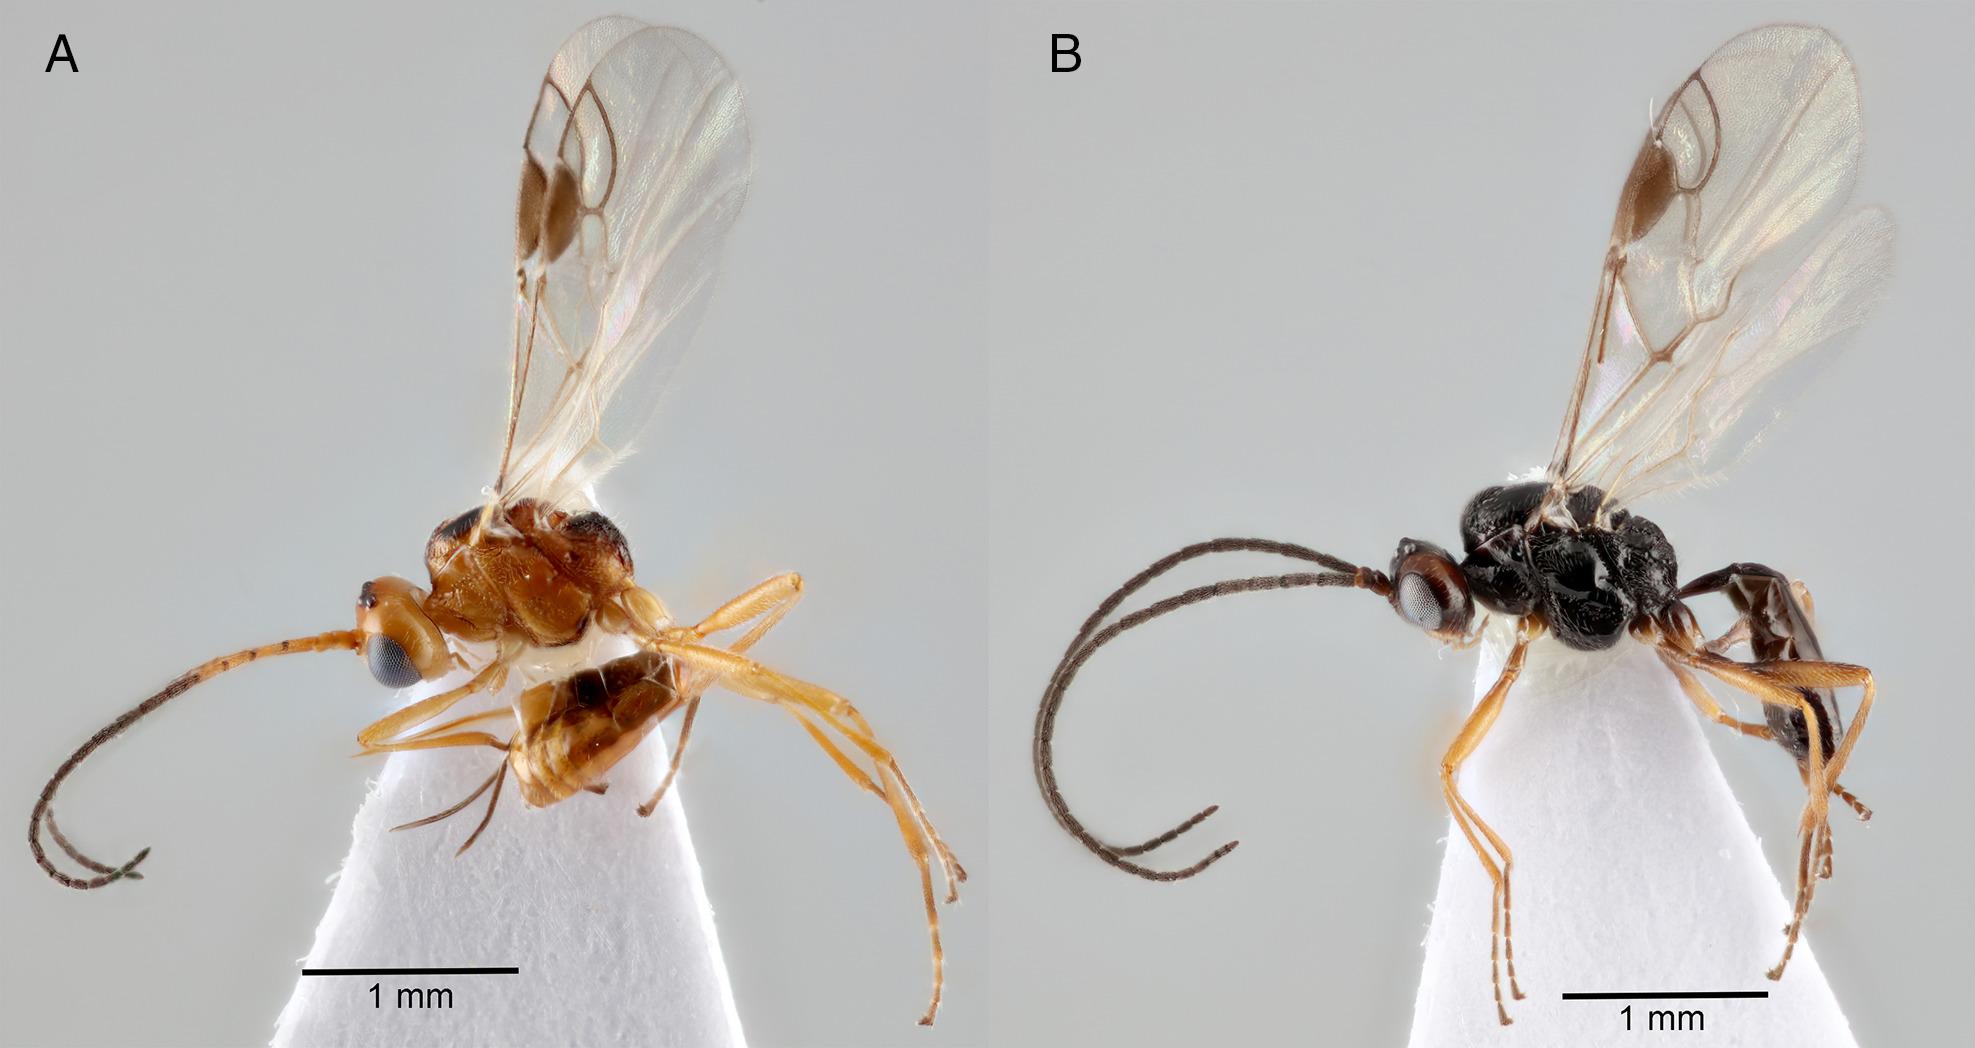 darázs darázs parazita gyomor rossz lehelet